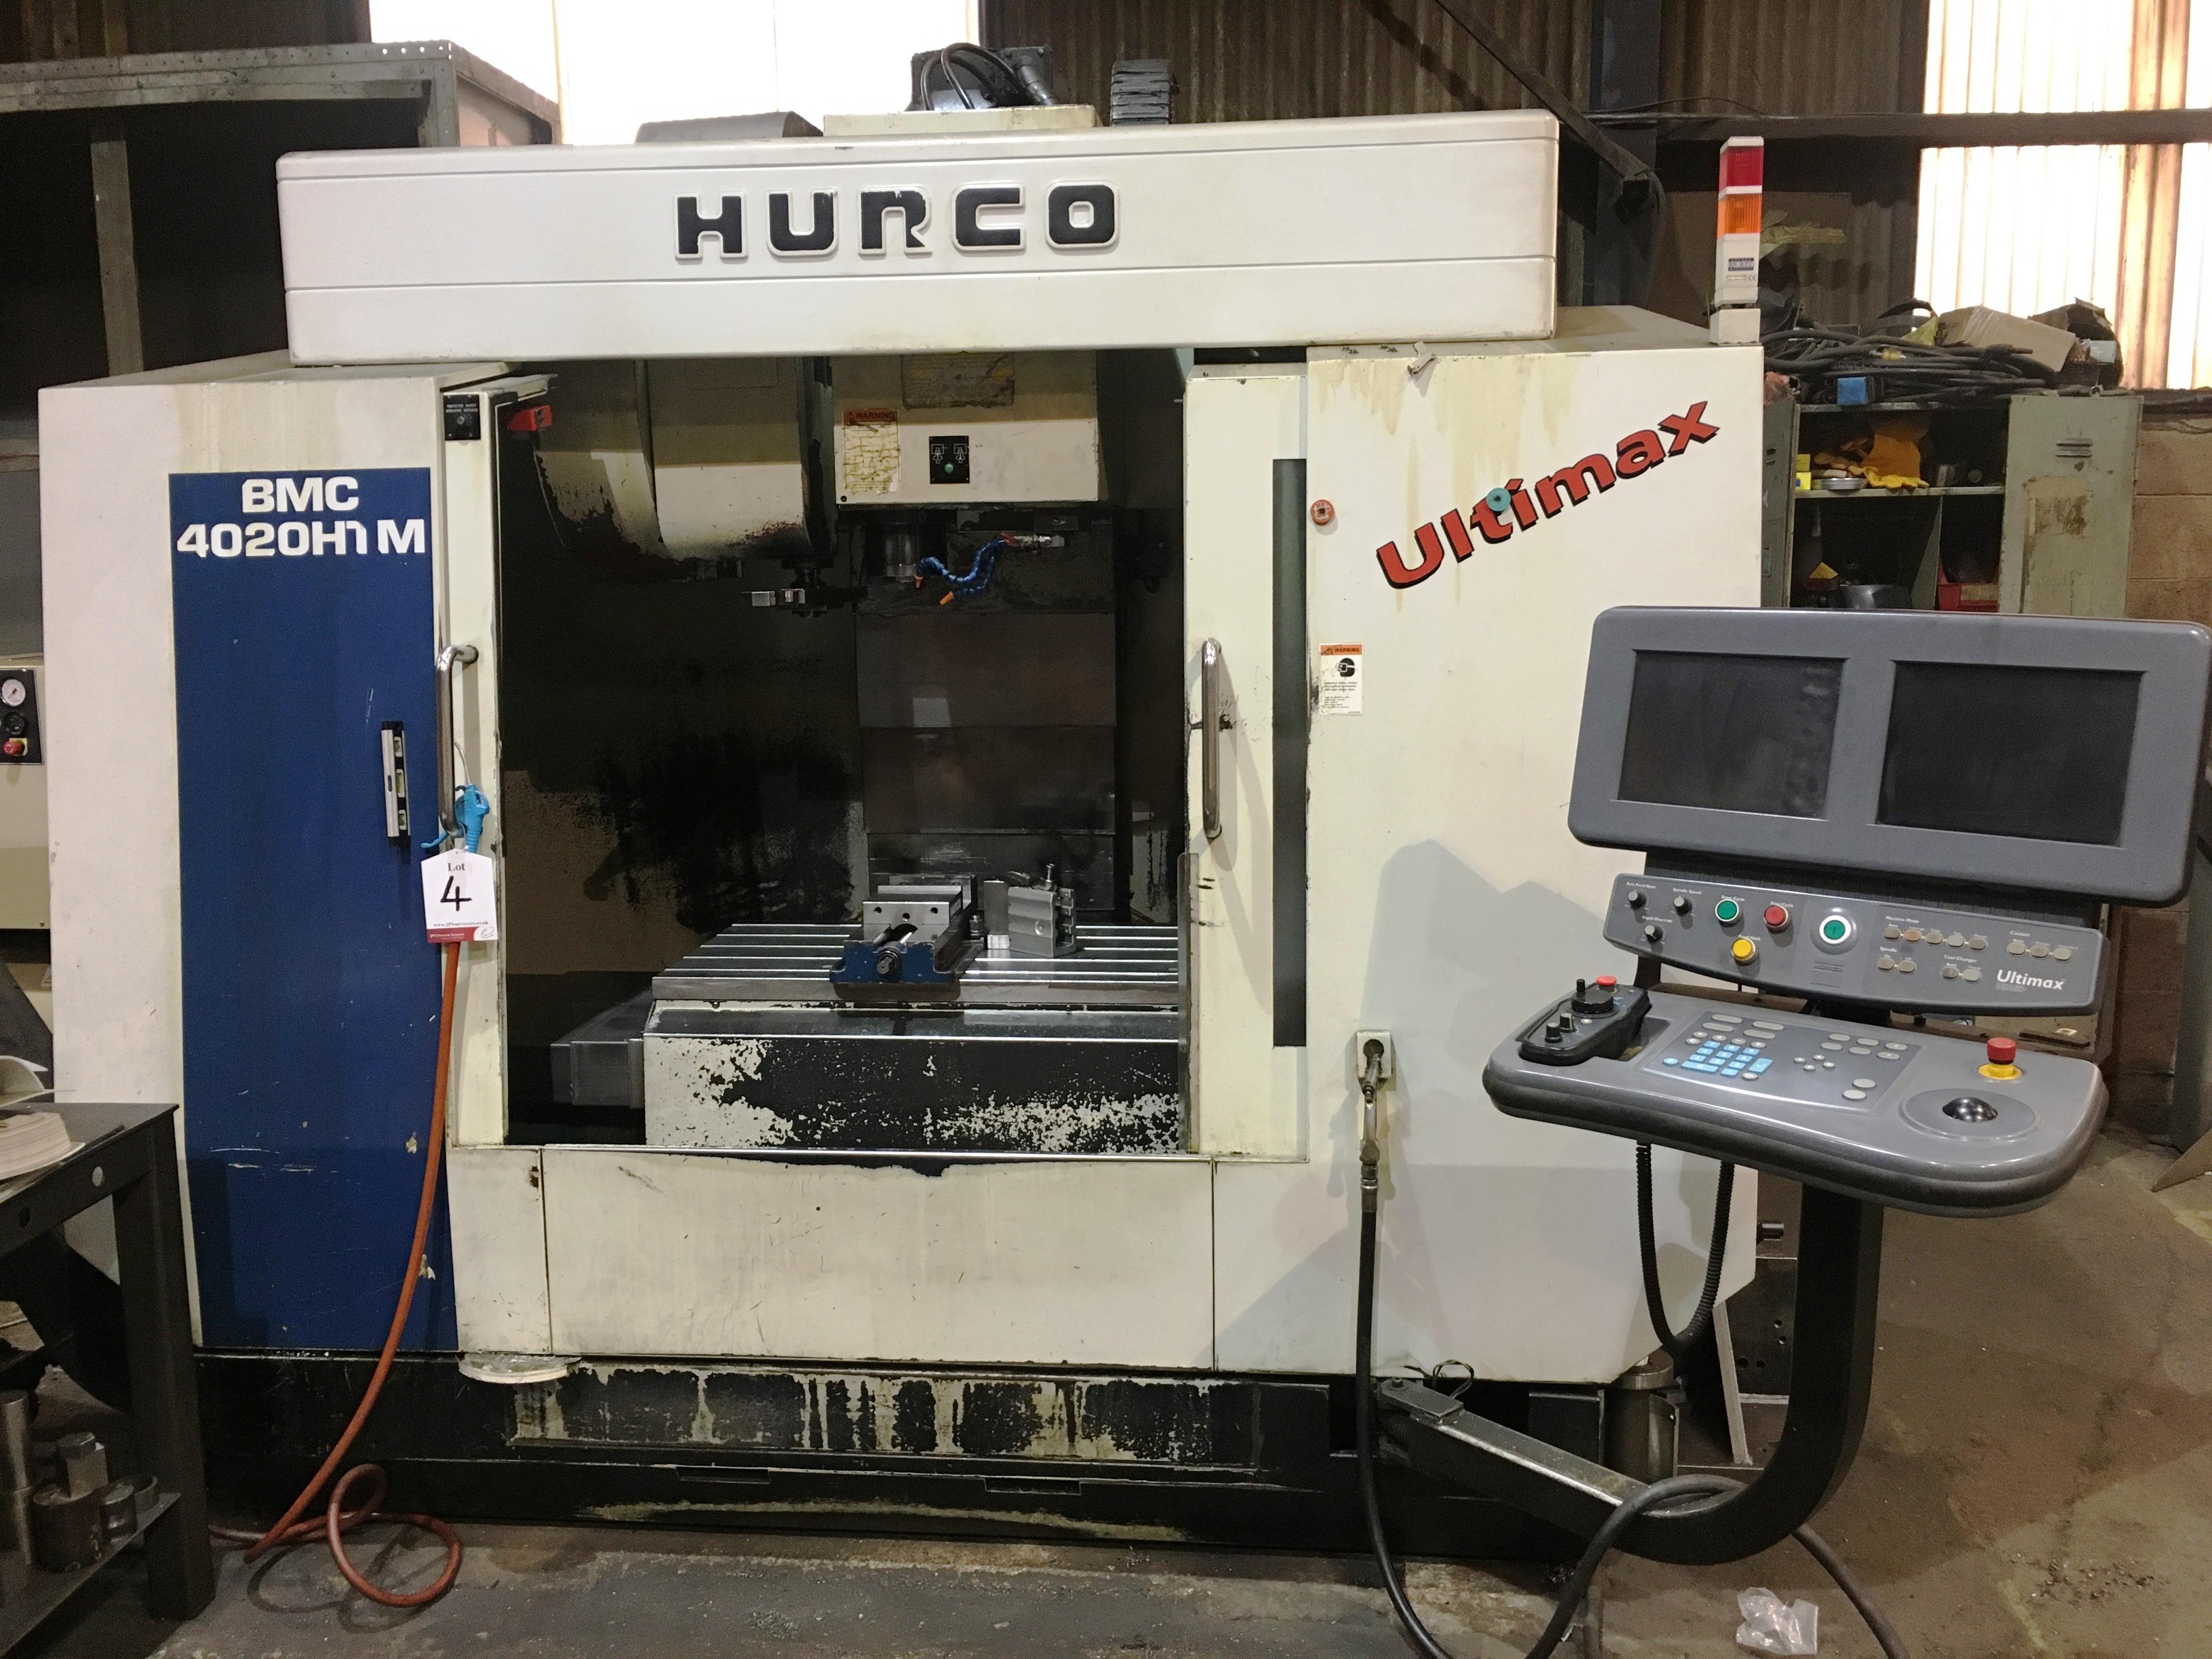 Hurco BMC 4020 HT/M CNC Vertical Machining Centre | YOM: 2000 - Image 2 of 16